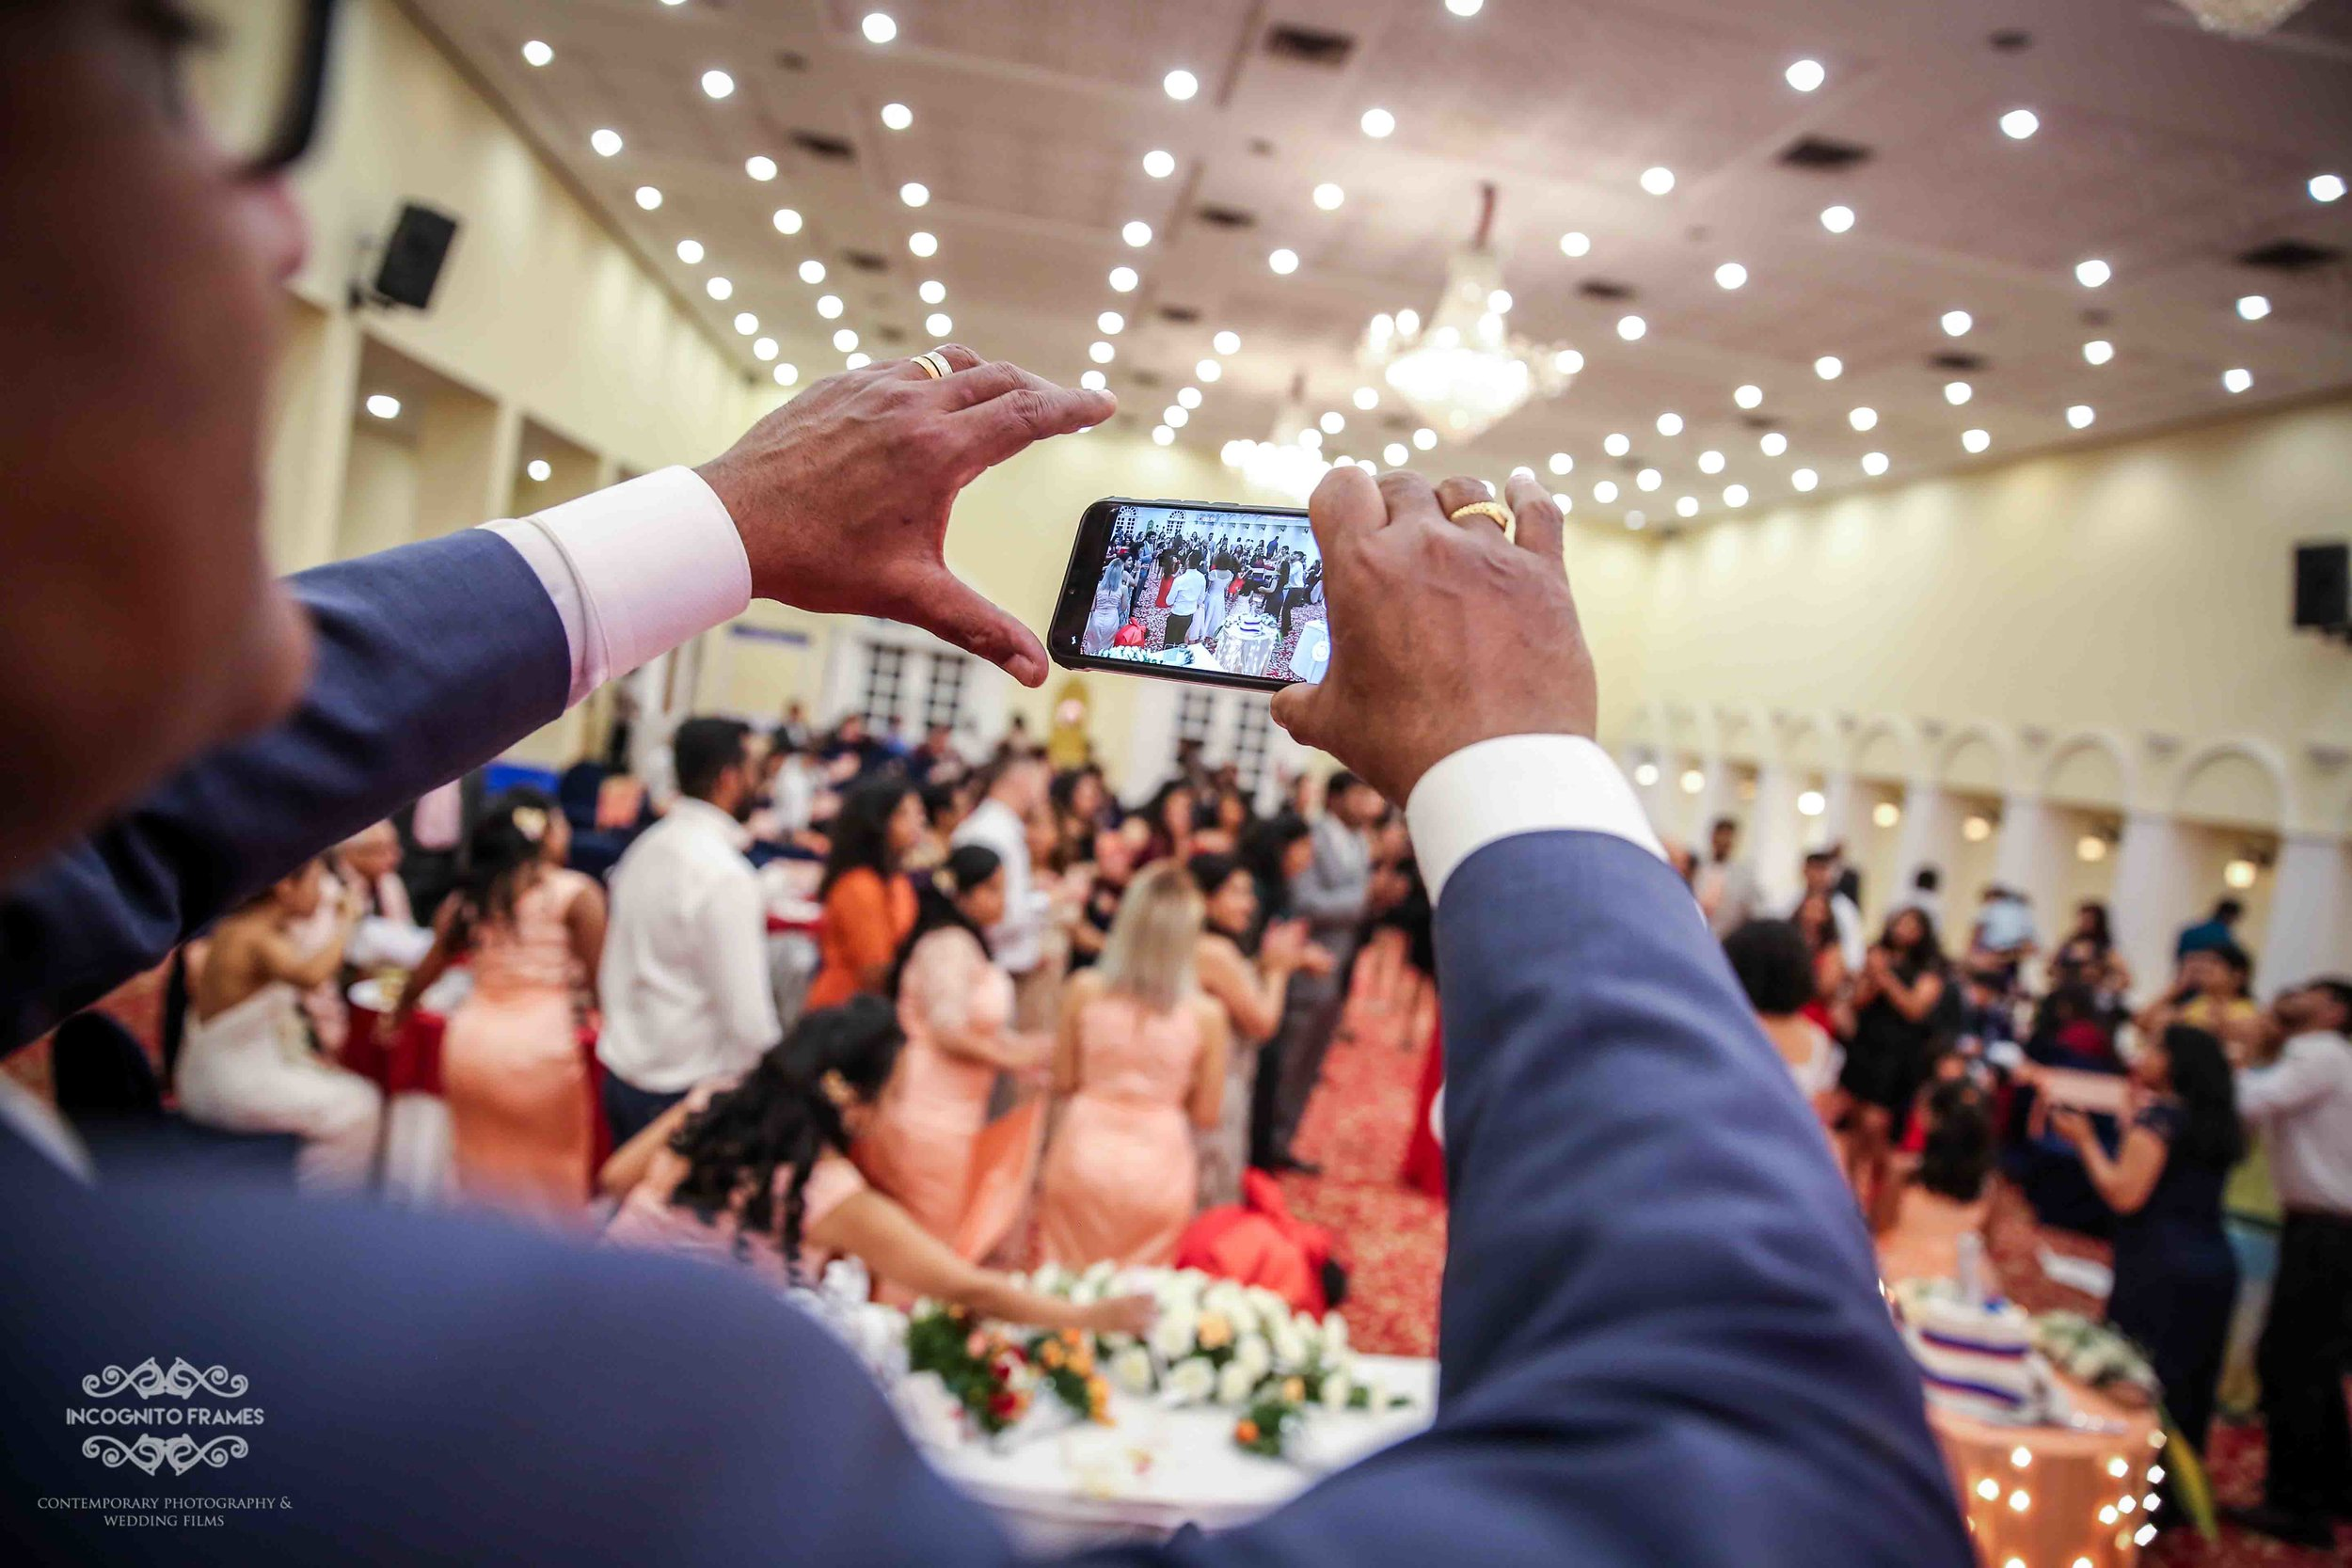 Christian-wedding-chennai.jpg